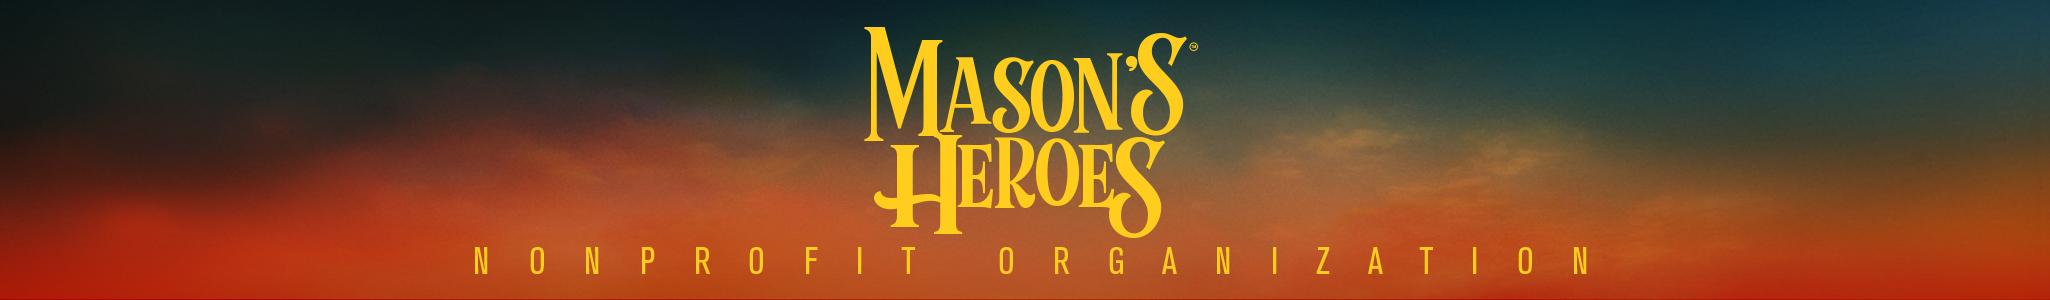 Mason'sHeroes-Header.jpg